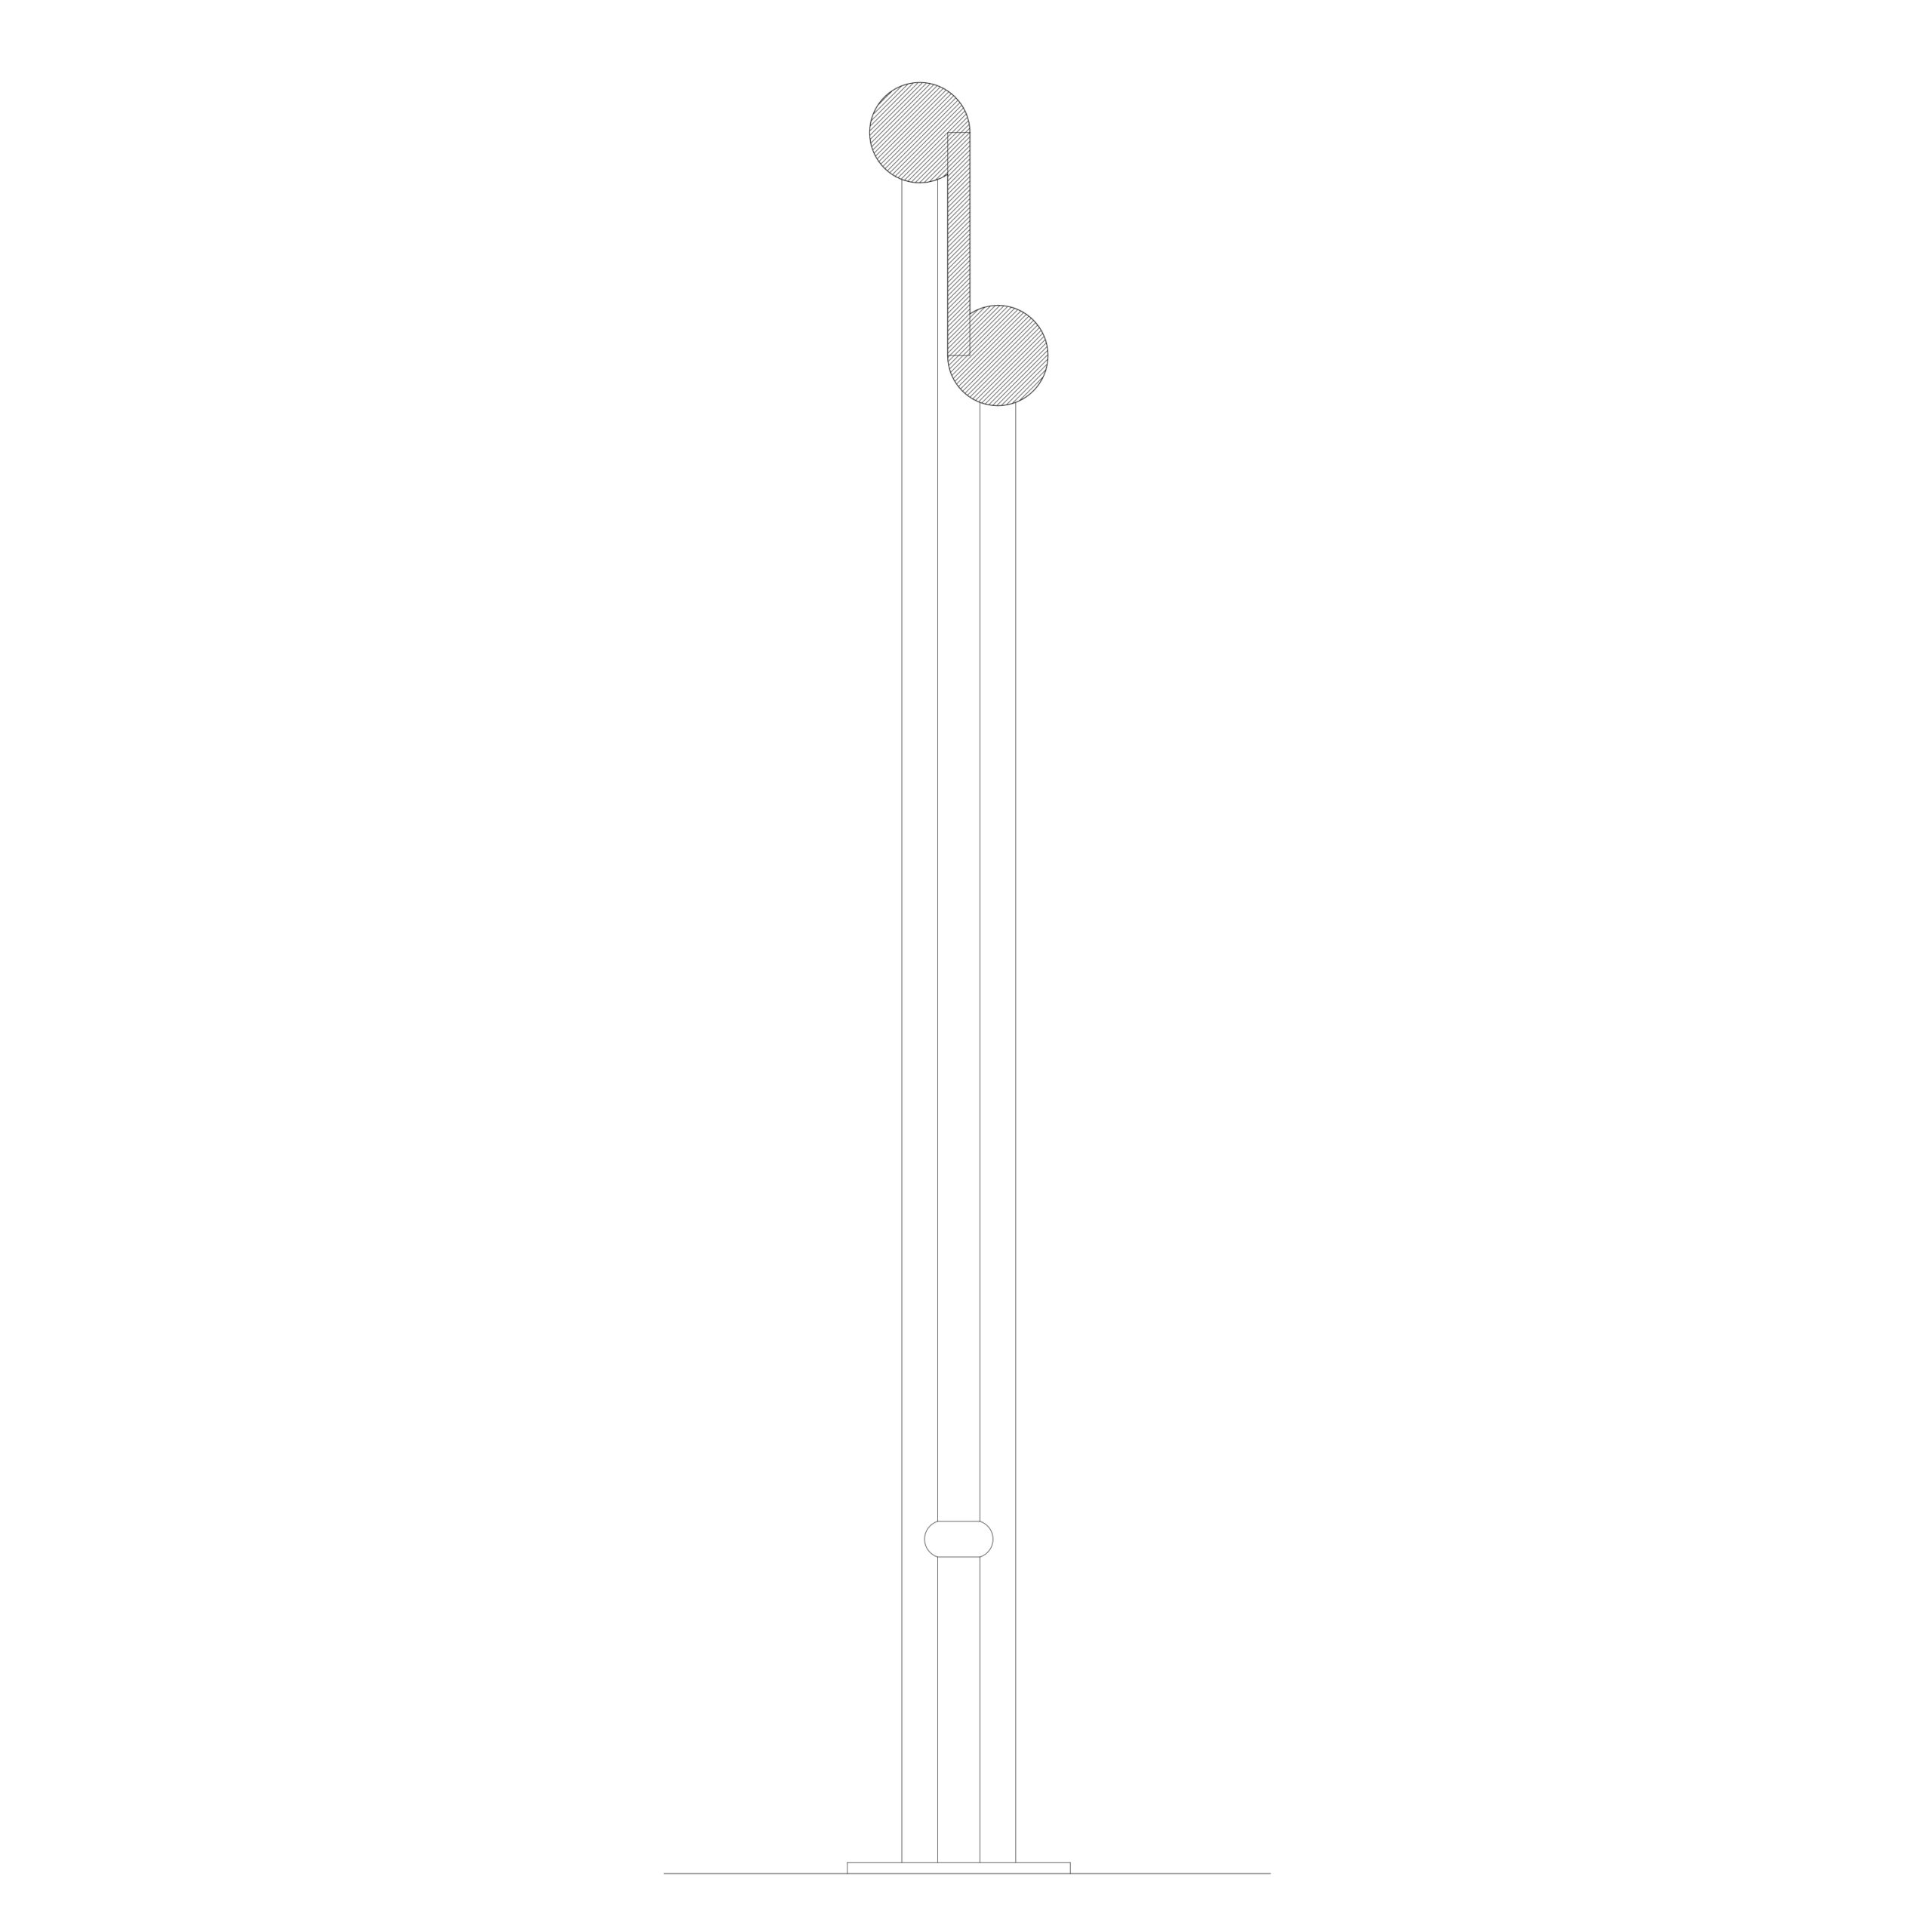 SAMI-obra_exhibition-calouste_gulbenkian_foundation_handrail-01